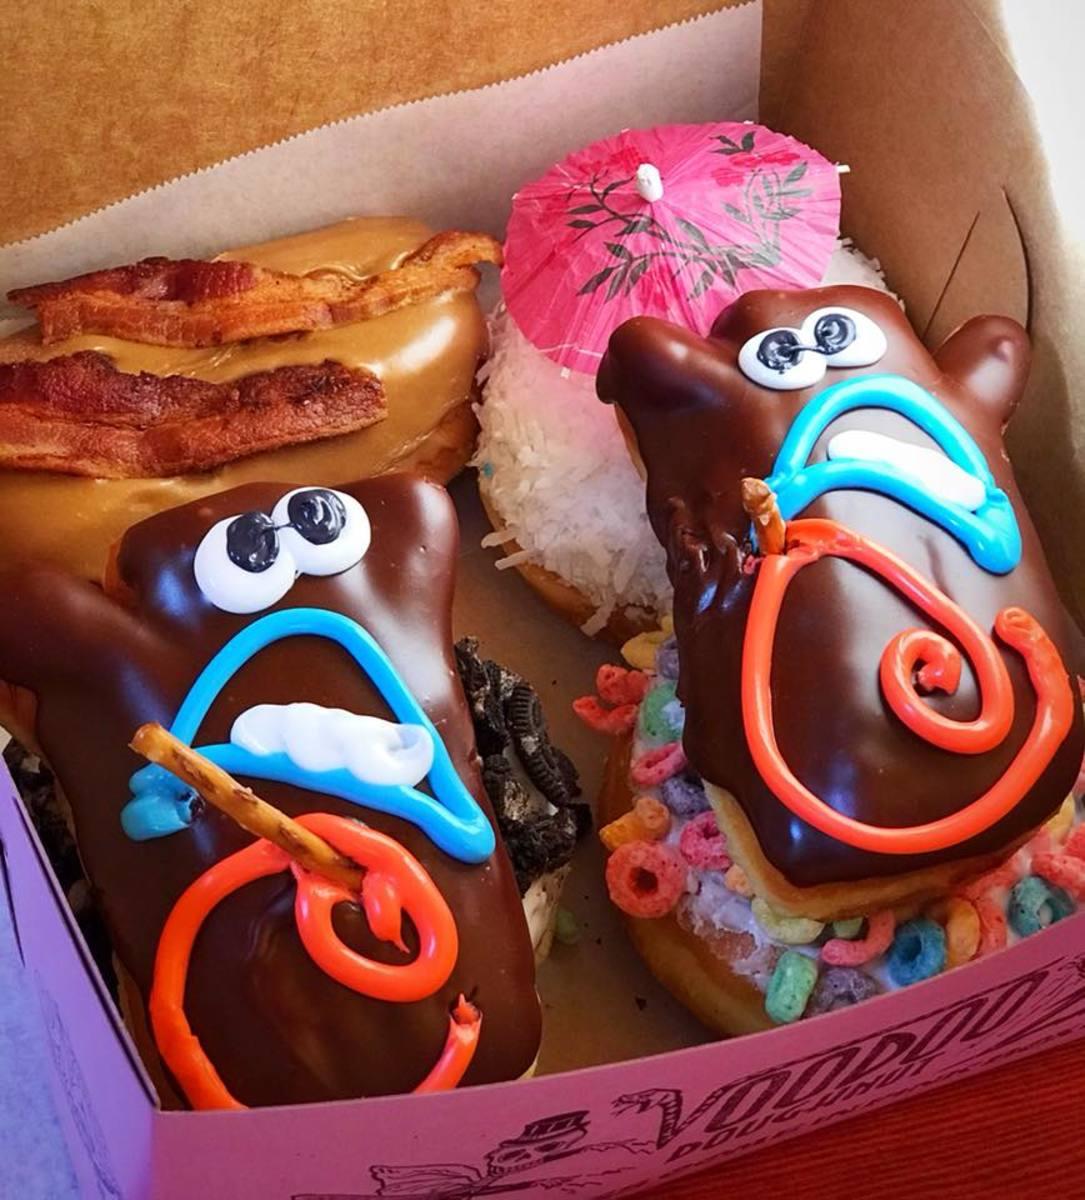 Yummy Voodoo Doughnuts from Voodoo Doughnuts in Portland.